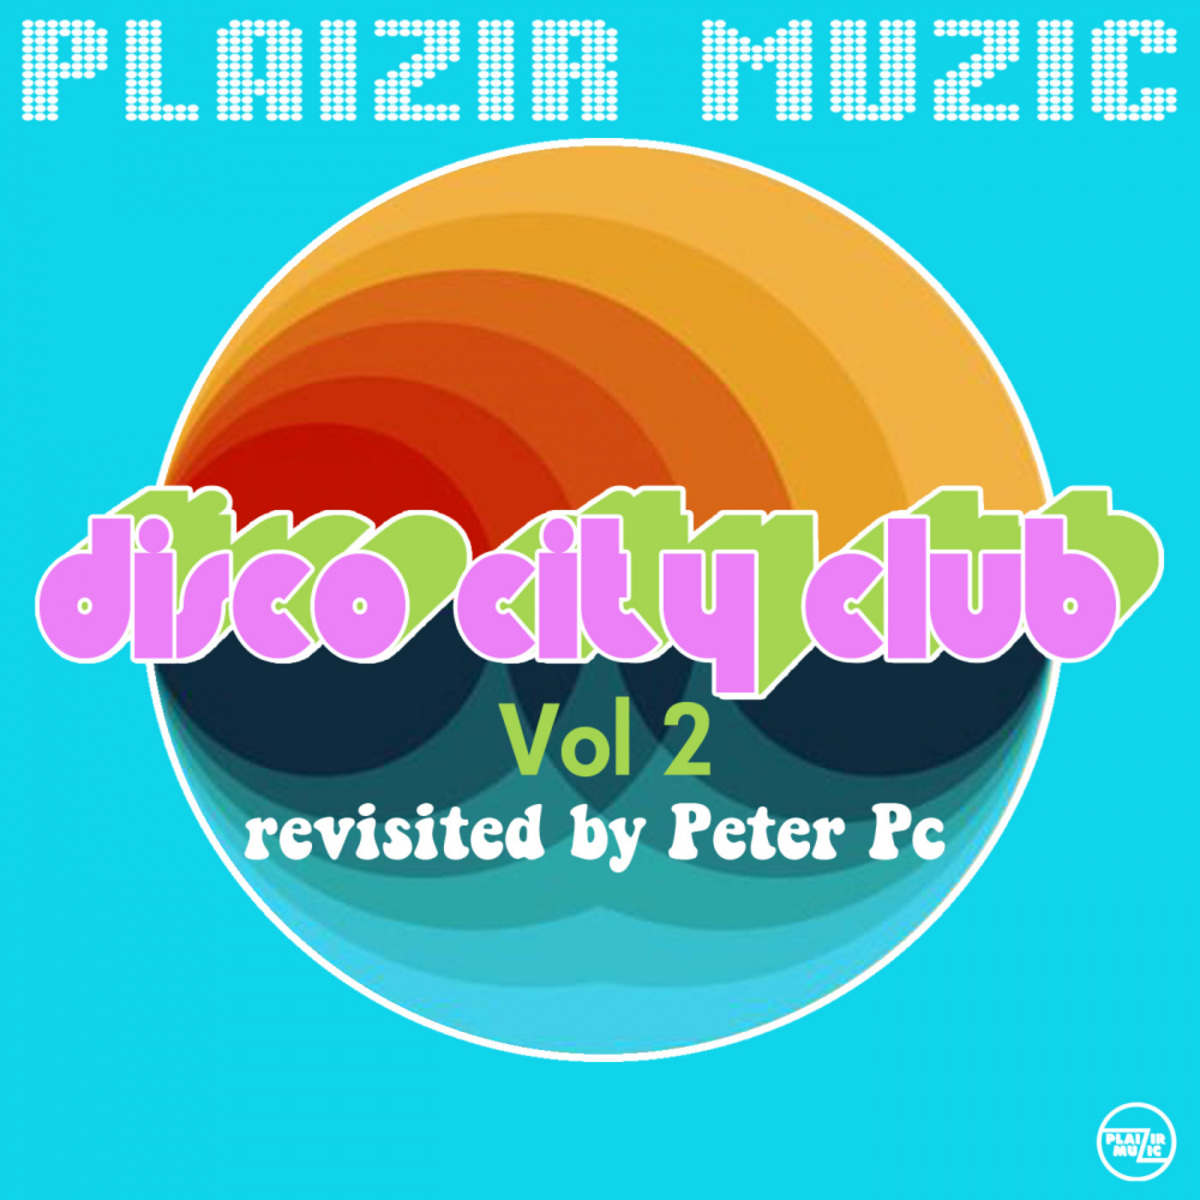 Peter Pc - Bep Bop  (Revisited Reedit)